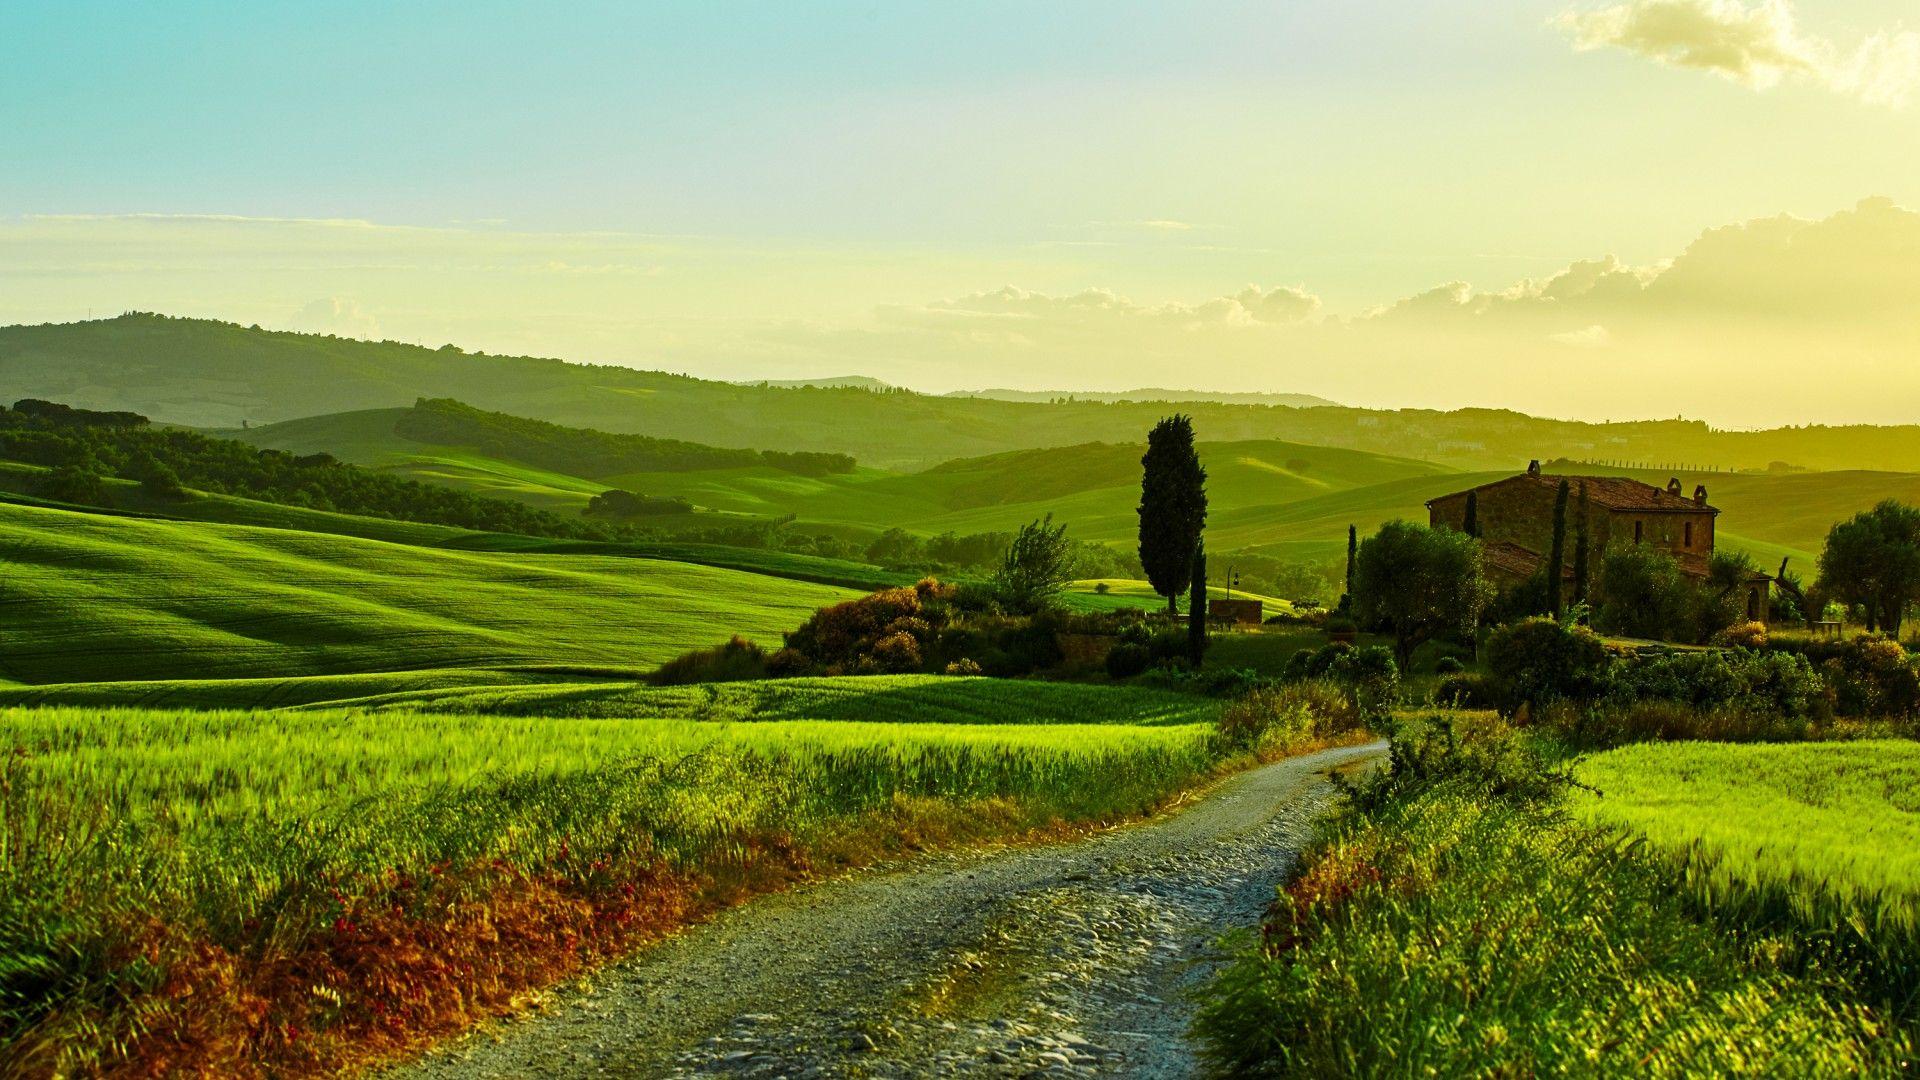 The Nature Of Italy Tuscany